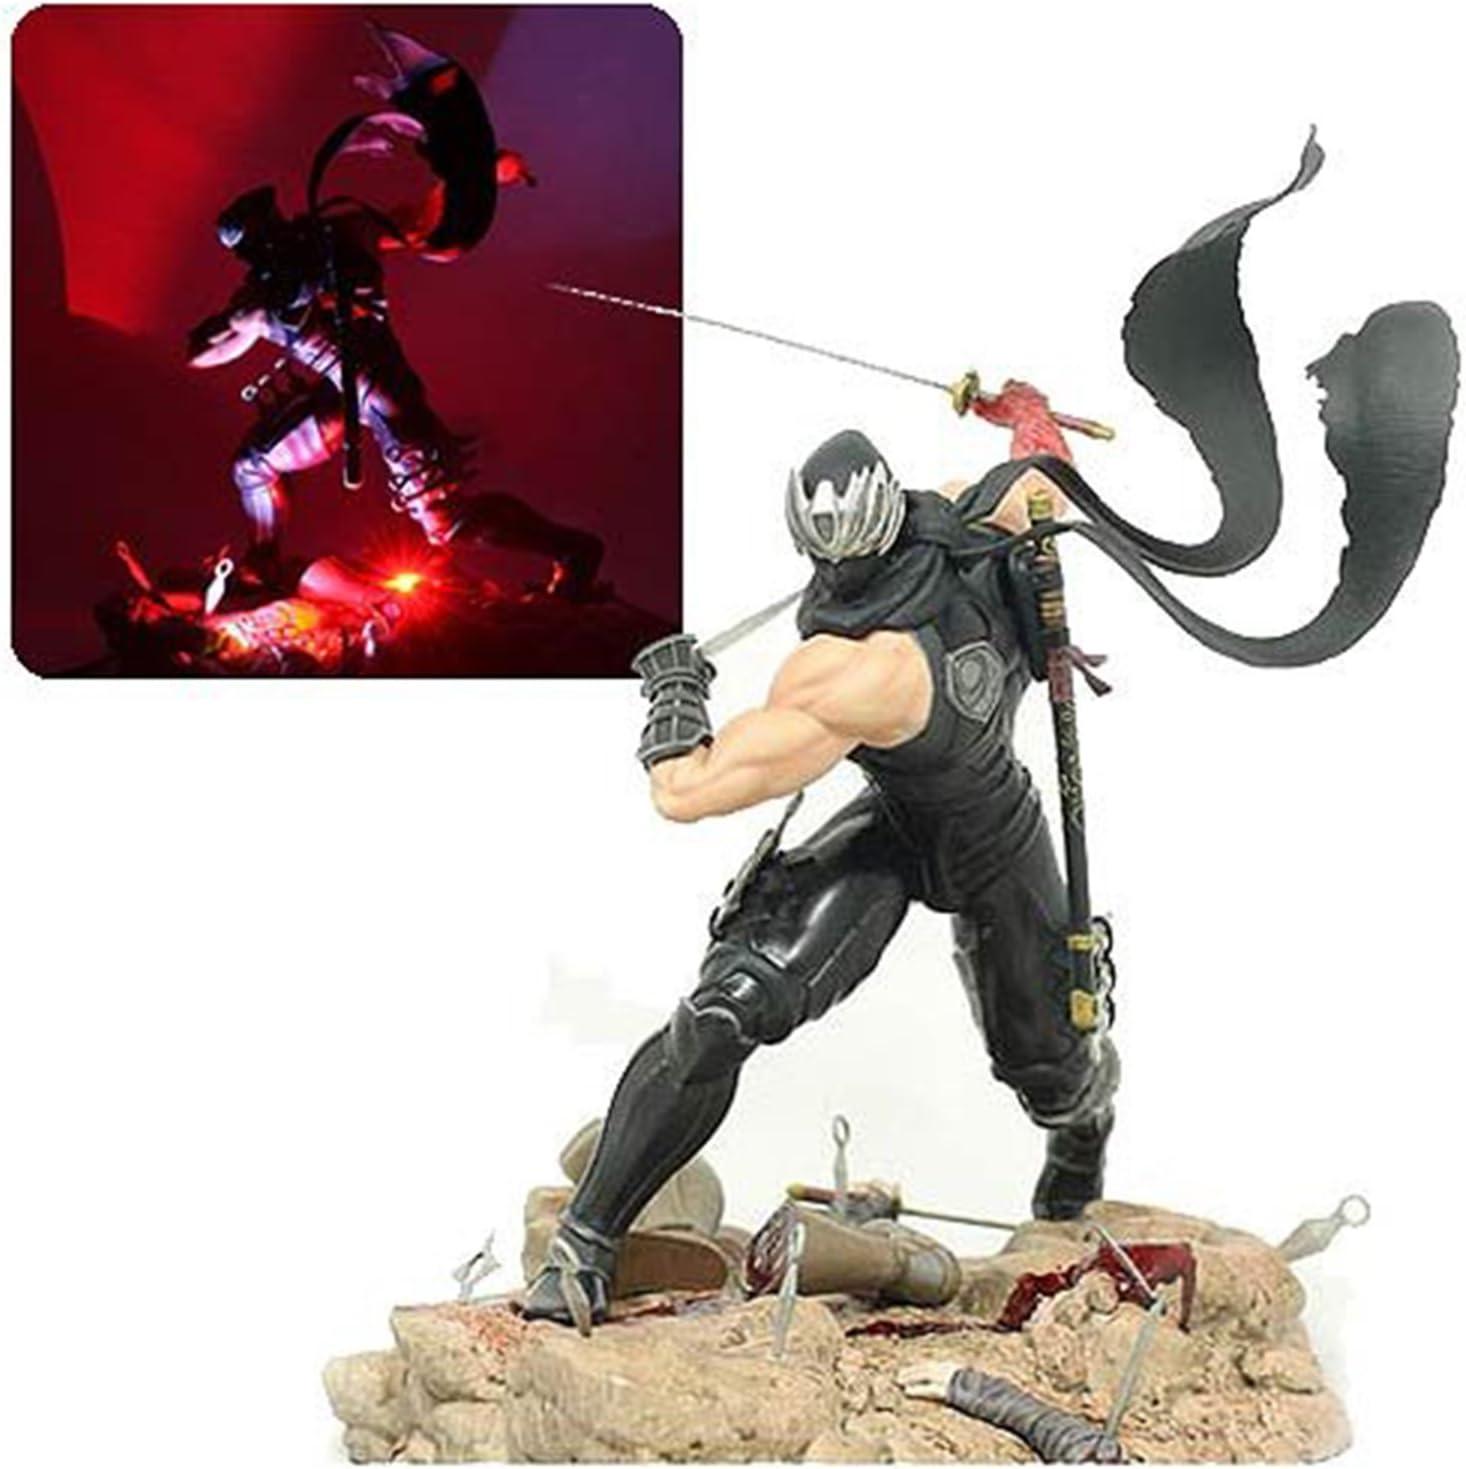 Amazon Com Ninja Gaiden 3 Ryu Hayabusa 13 Inch Statue 200 Pieces